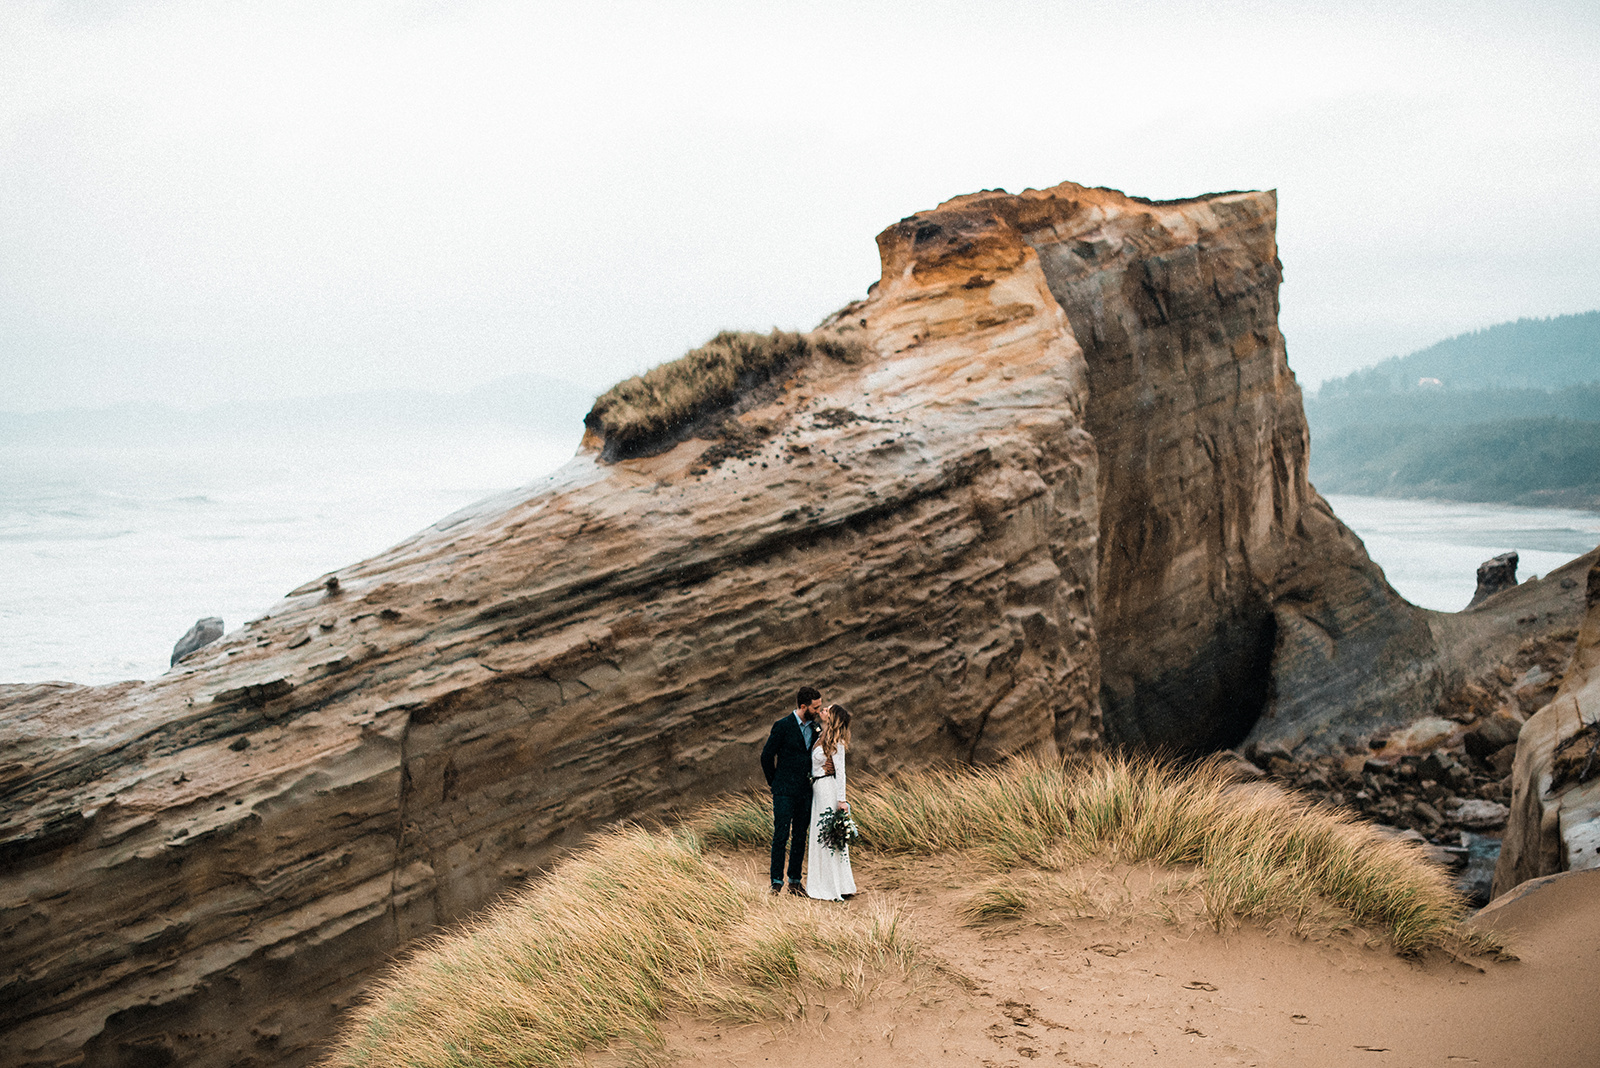 Oregon_Coast_Elopement_Wedding_The_Foxes_Photography_097.jpg